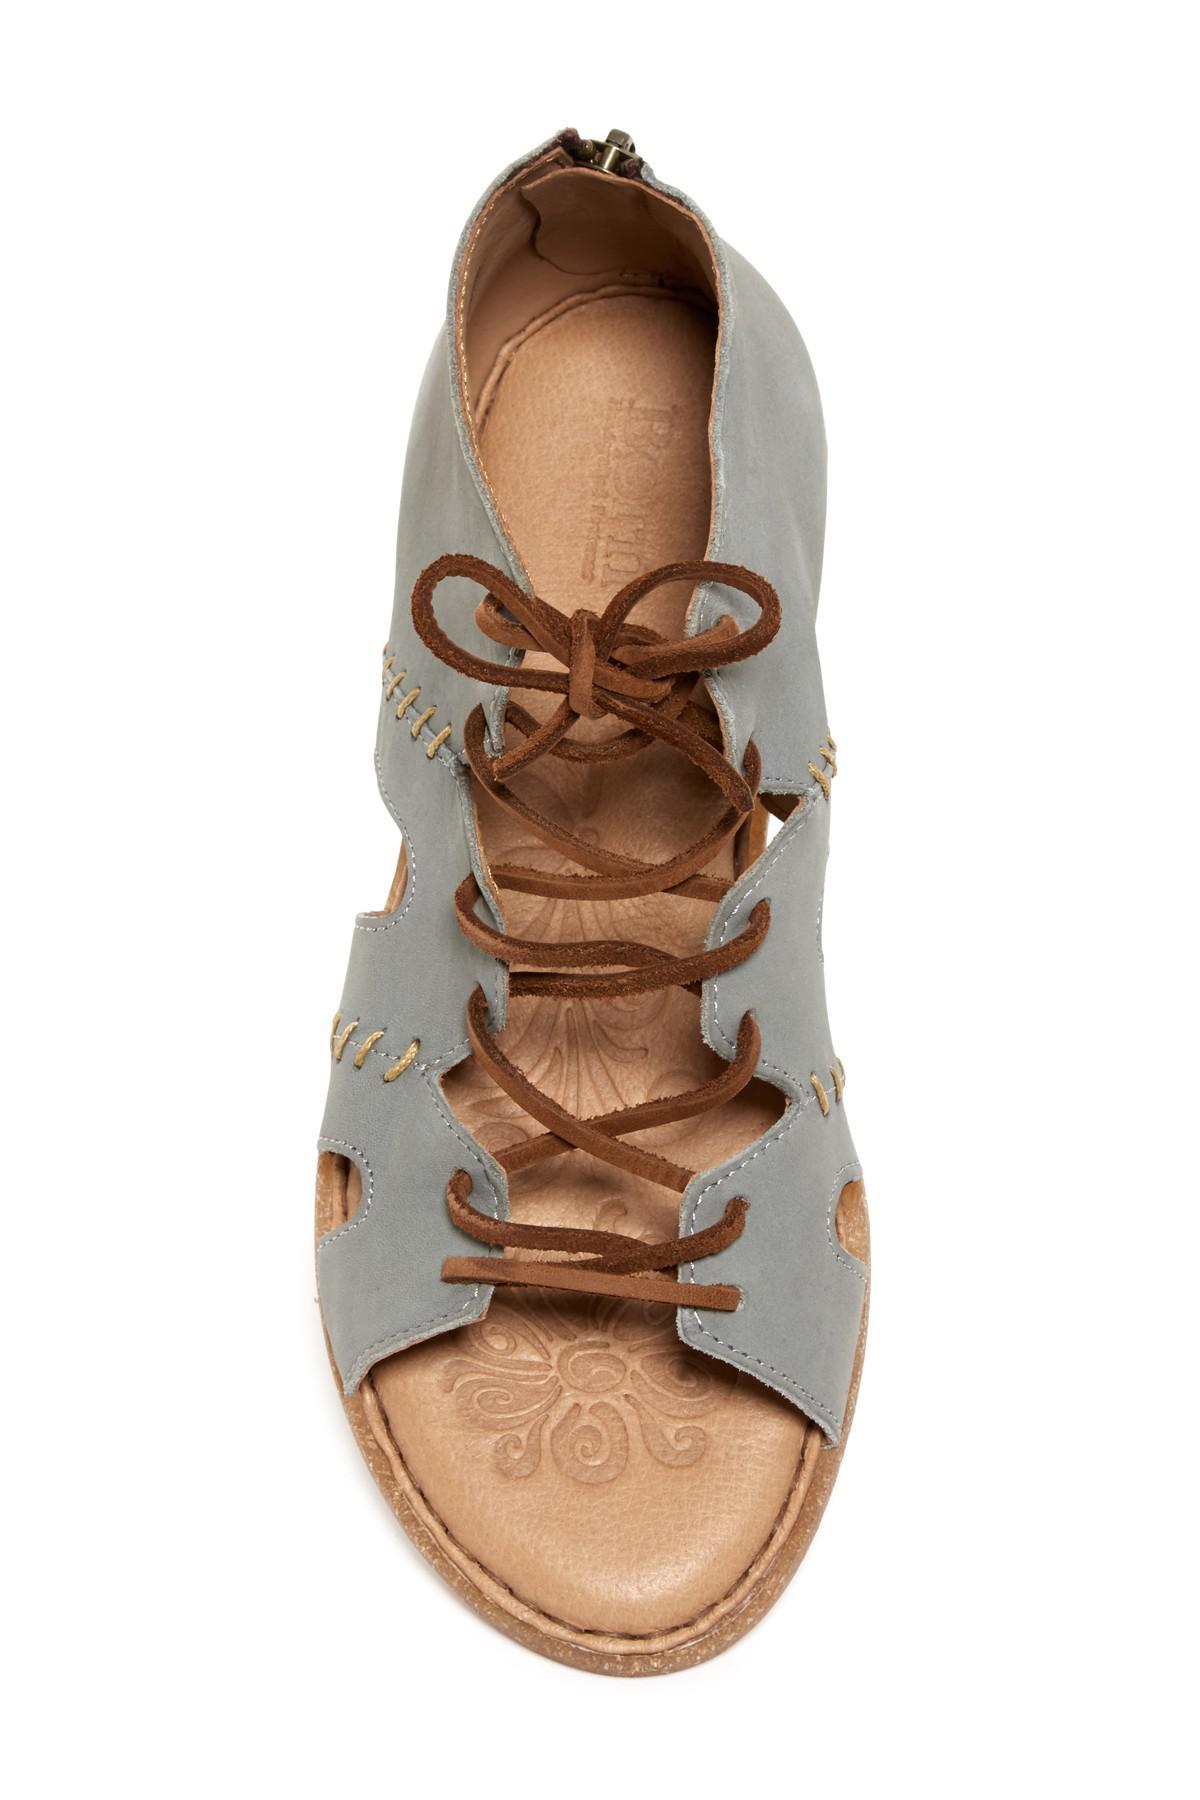 5bbb5a78b74e Lyst - Born Nea Nubuck Gladiator Sandal in Gray